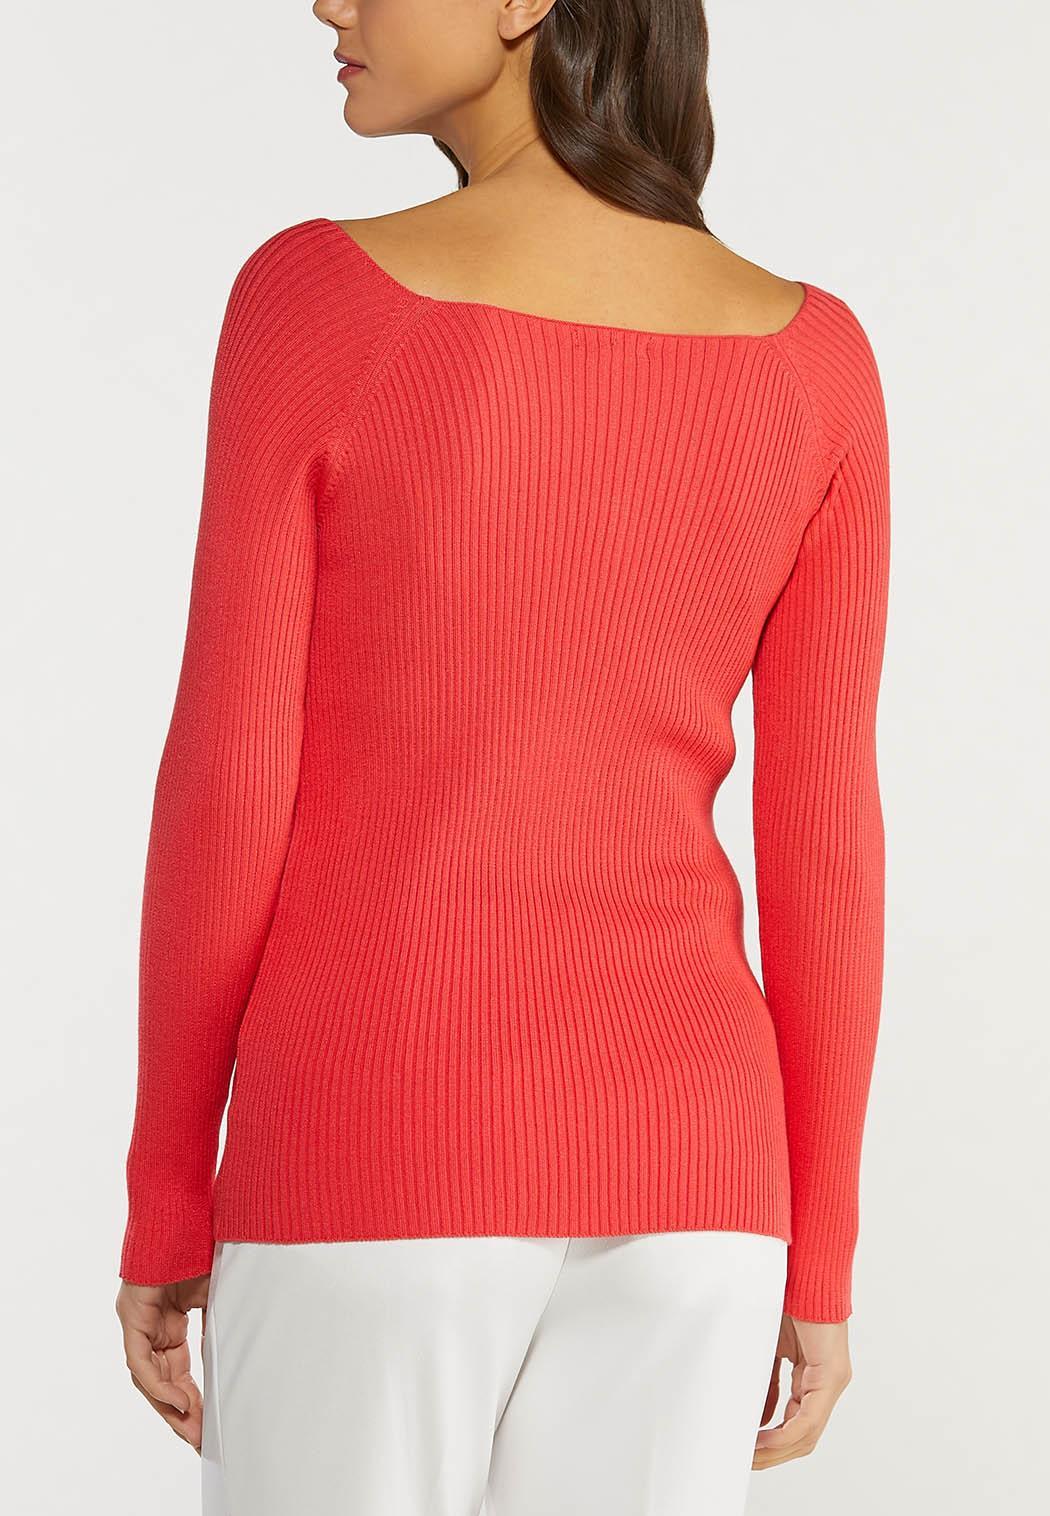 Boat Neck Sweater (Item #44492671)